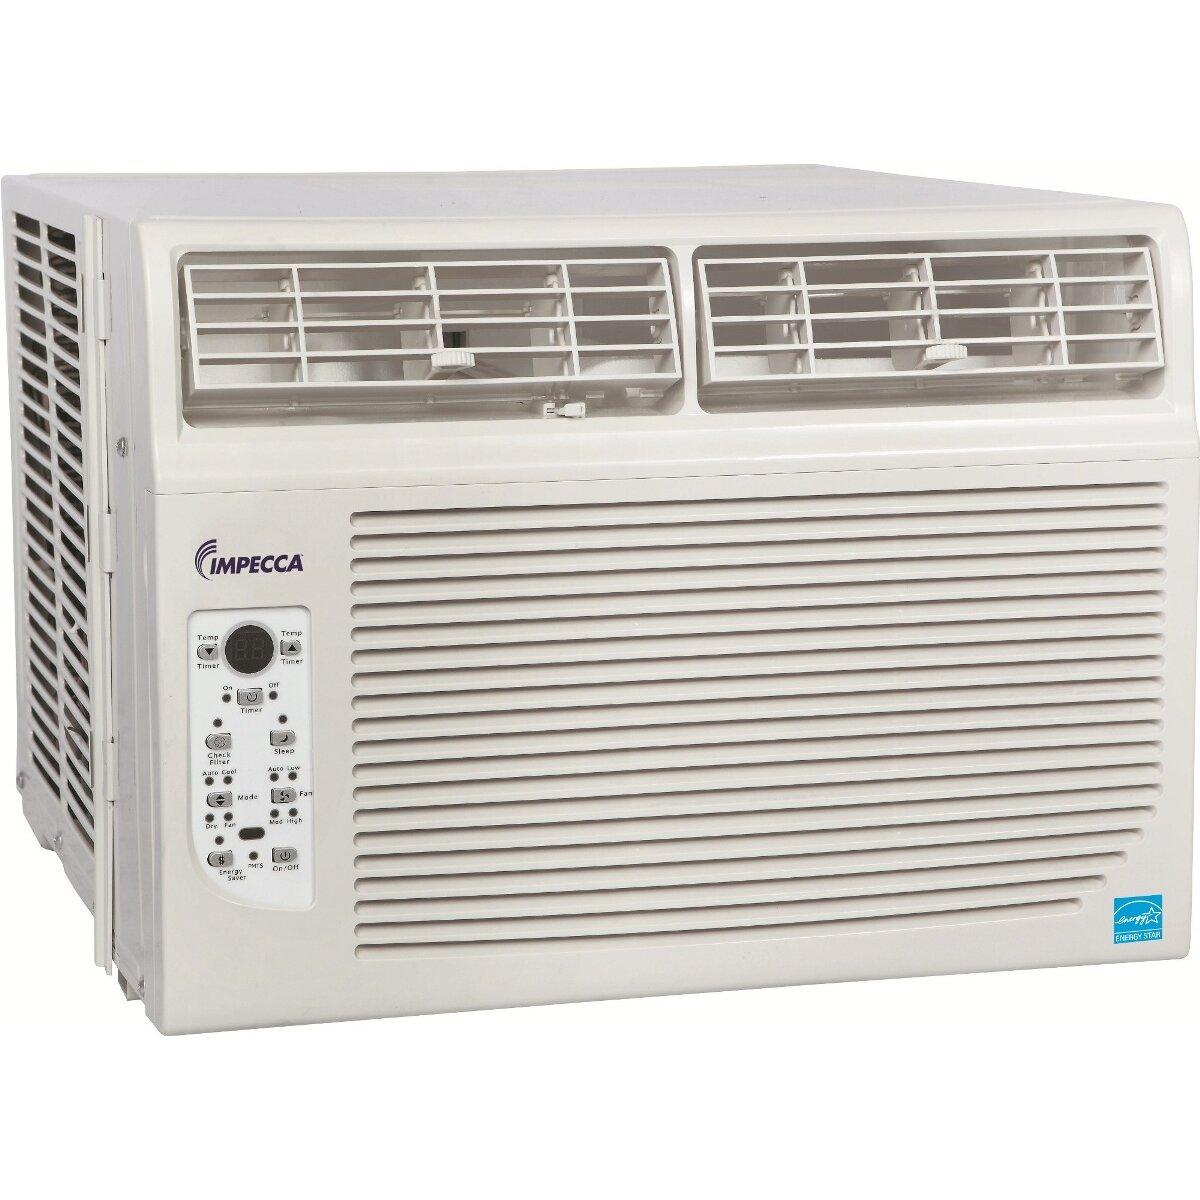 Impecca USA 8000 BTU Compact Window Air Conditioner #1090BB